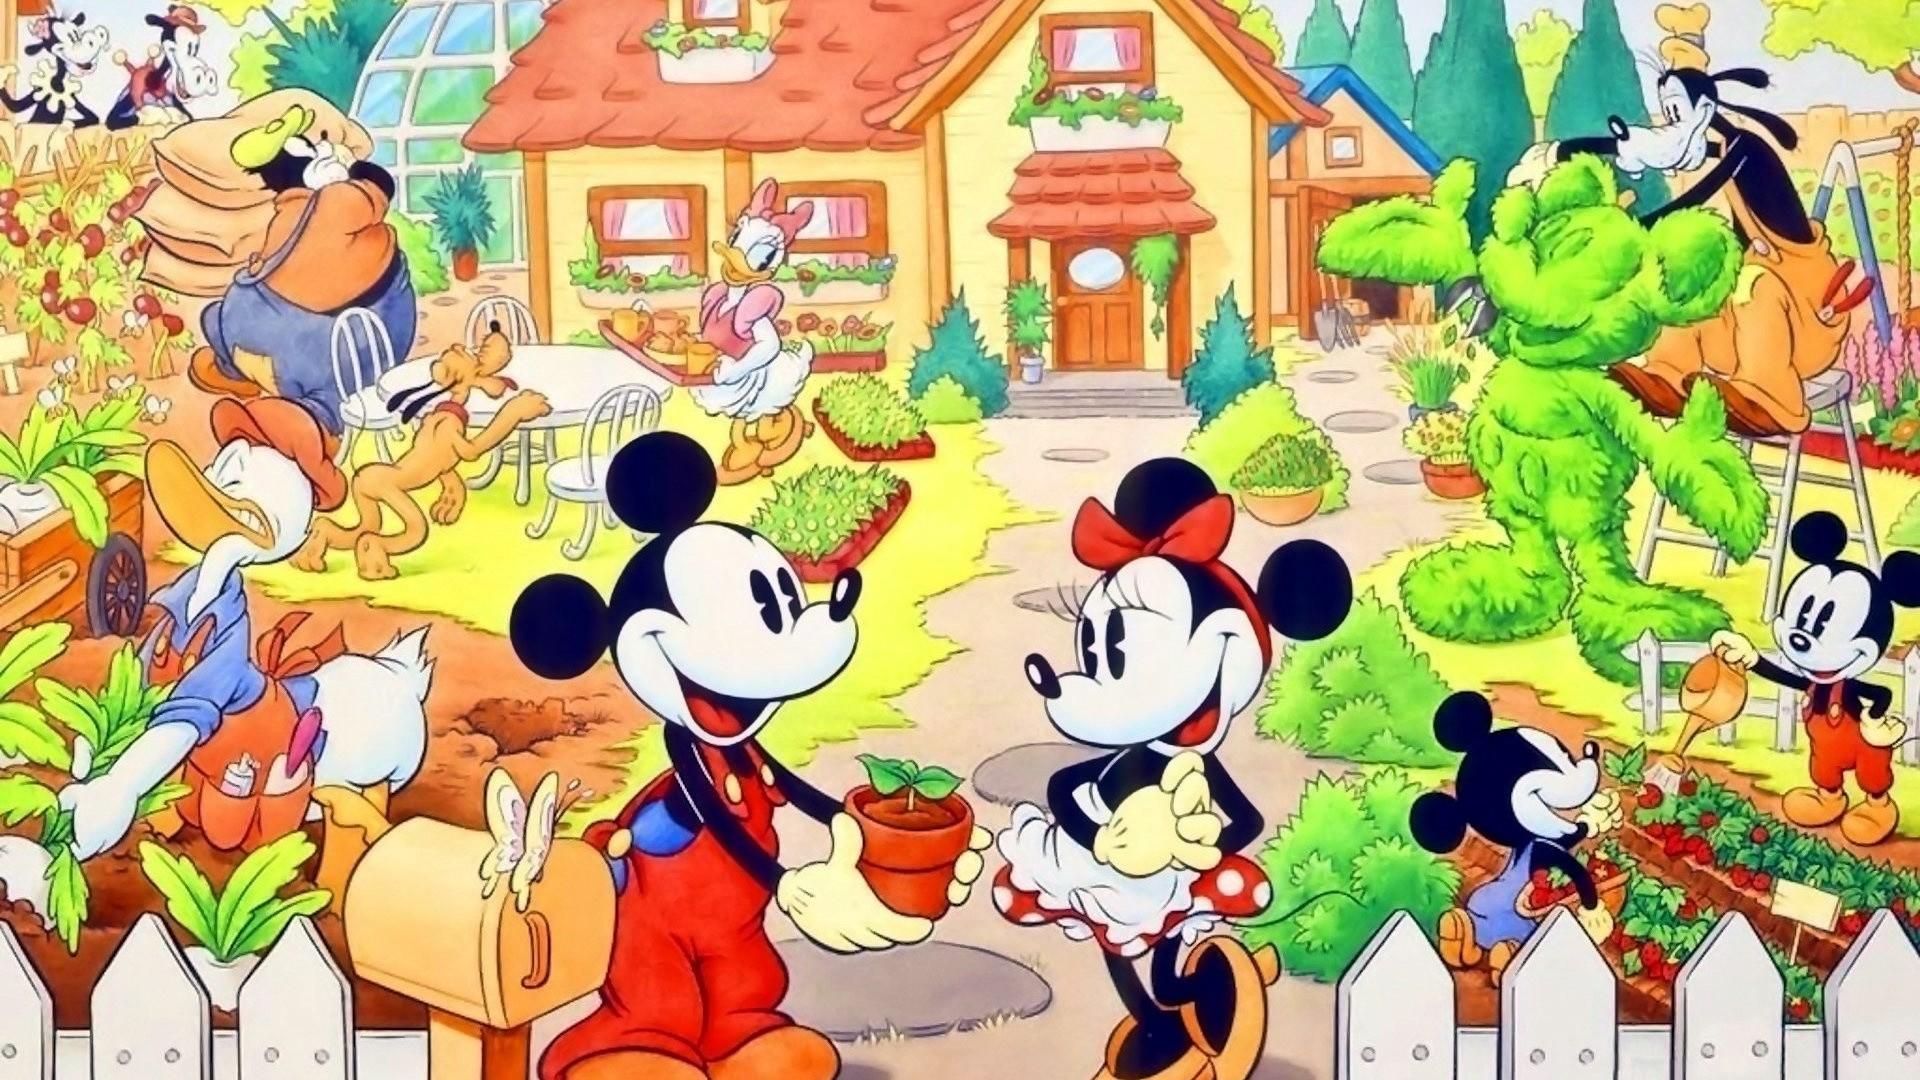 Res: 1920x1080, Related Posts · Walt Disney Characters Wallpaper ...